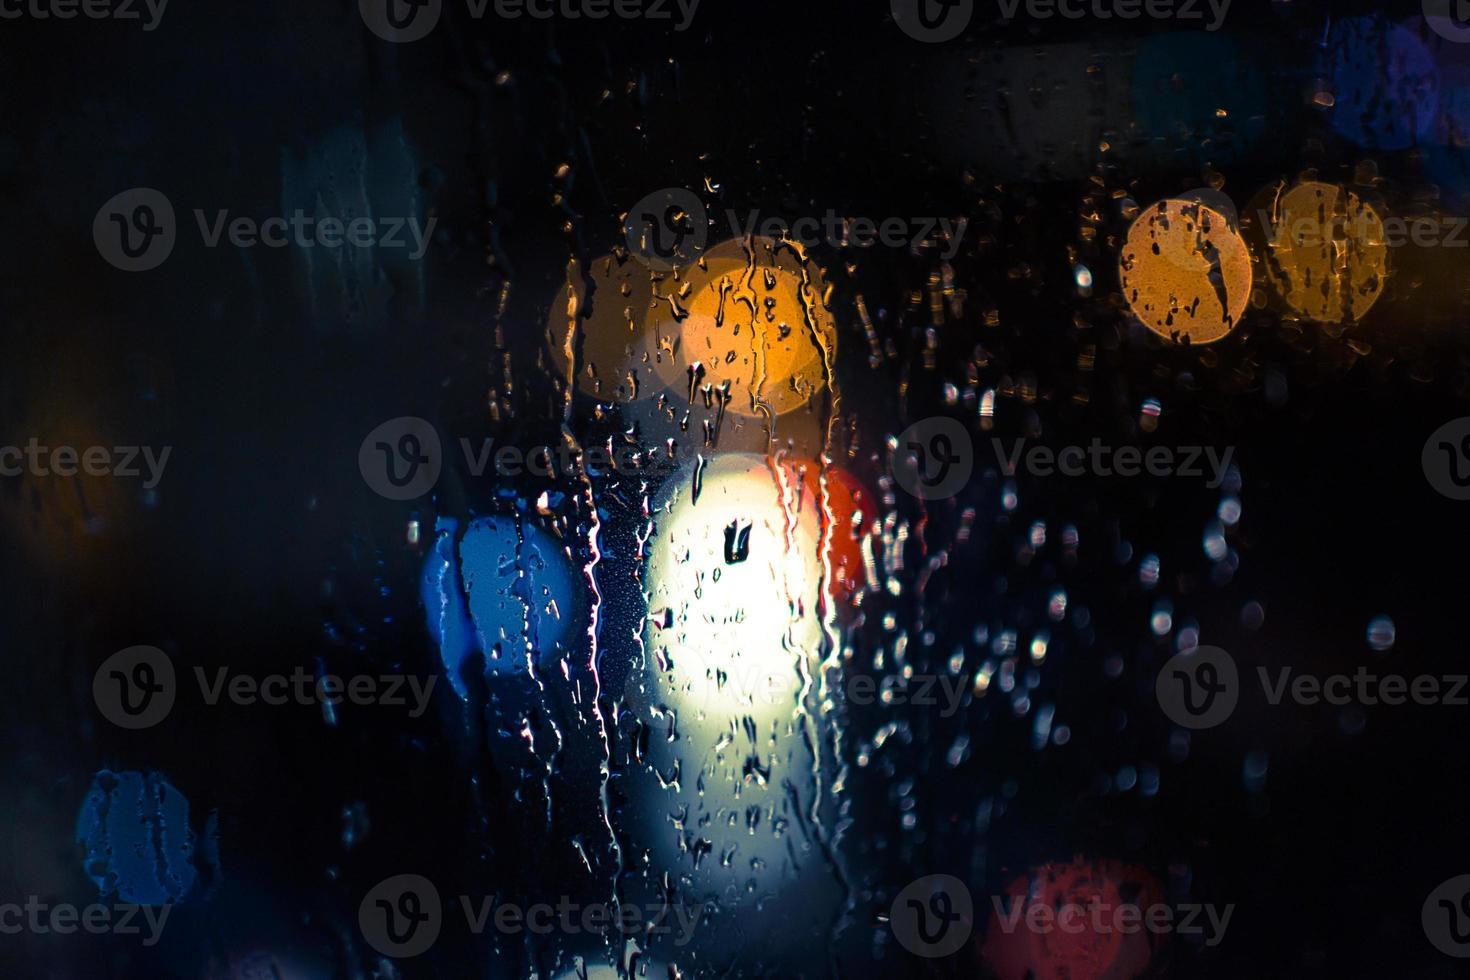 Car Headlights and Streetlights in Rain photo